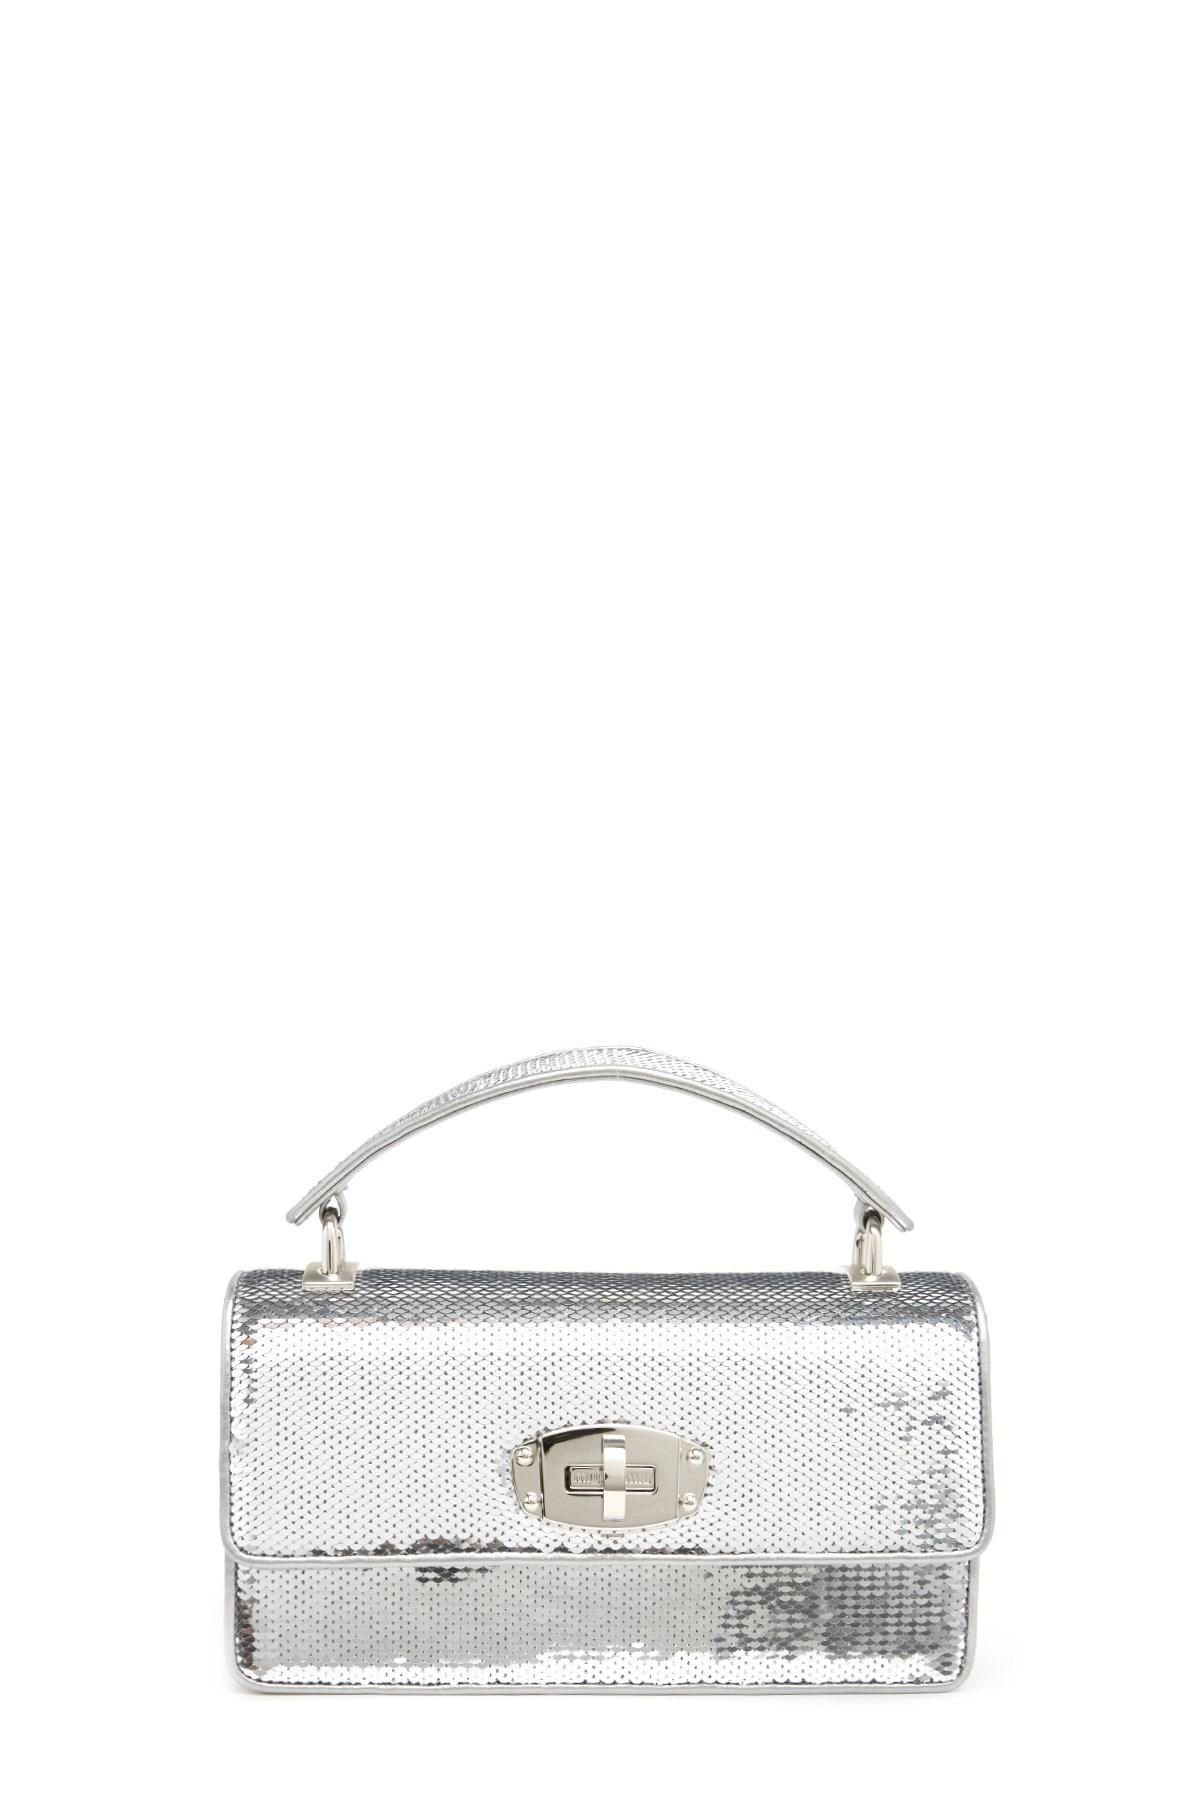 miu miu sequins hand bag available on julian-fashion.com - 54129 8e76589b68